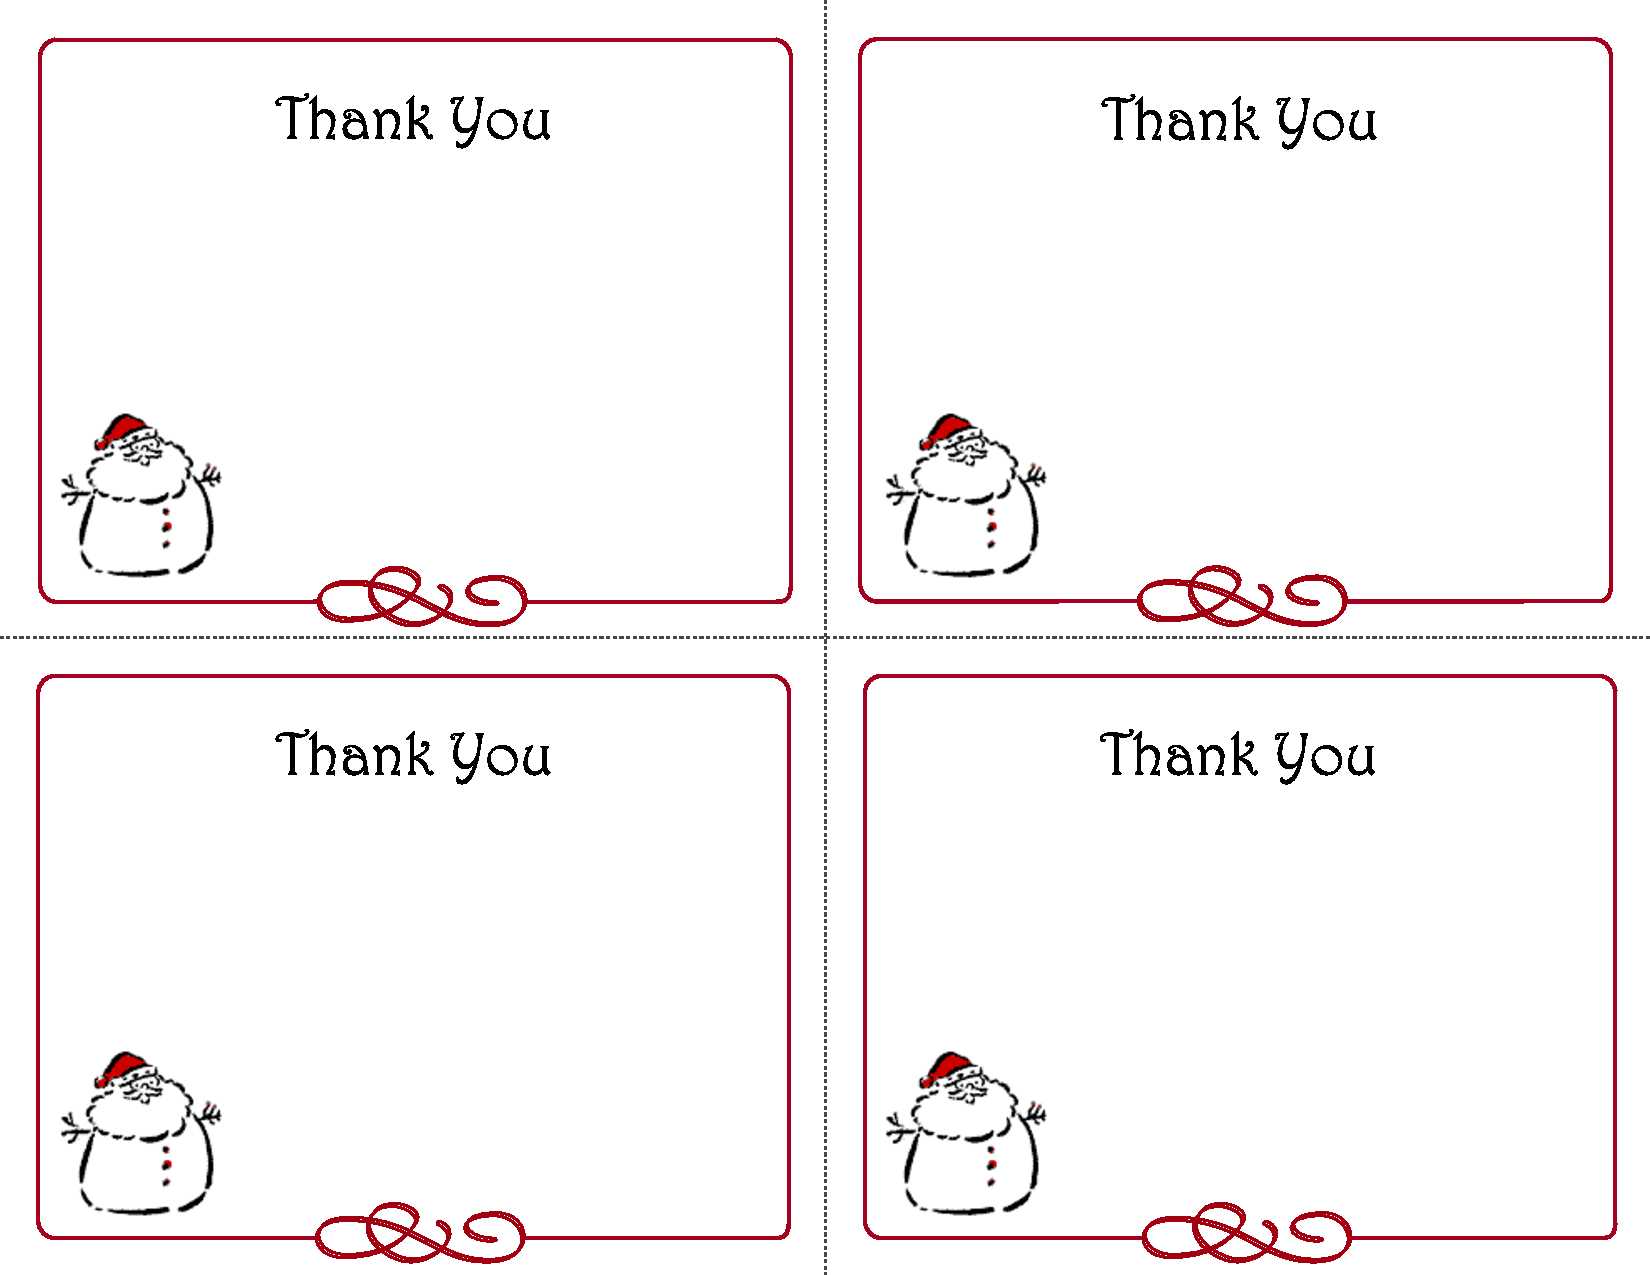 Free Thank You Cards Printable | Free Printable Holiday Gift Tags - Free Online Printable Christmas Cards